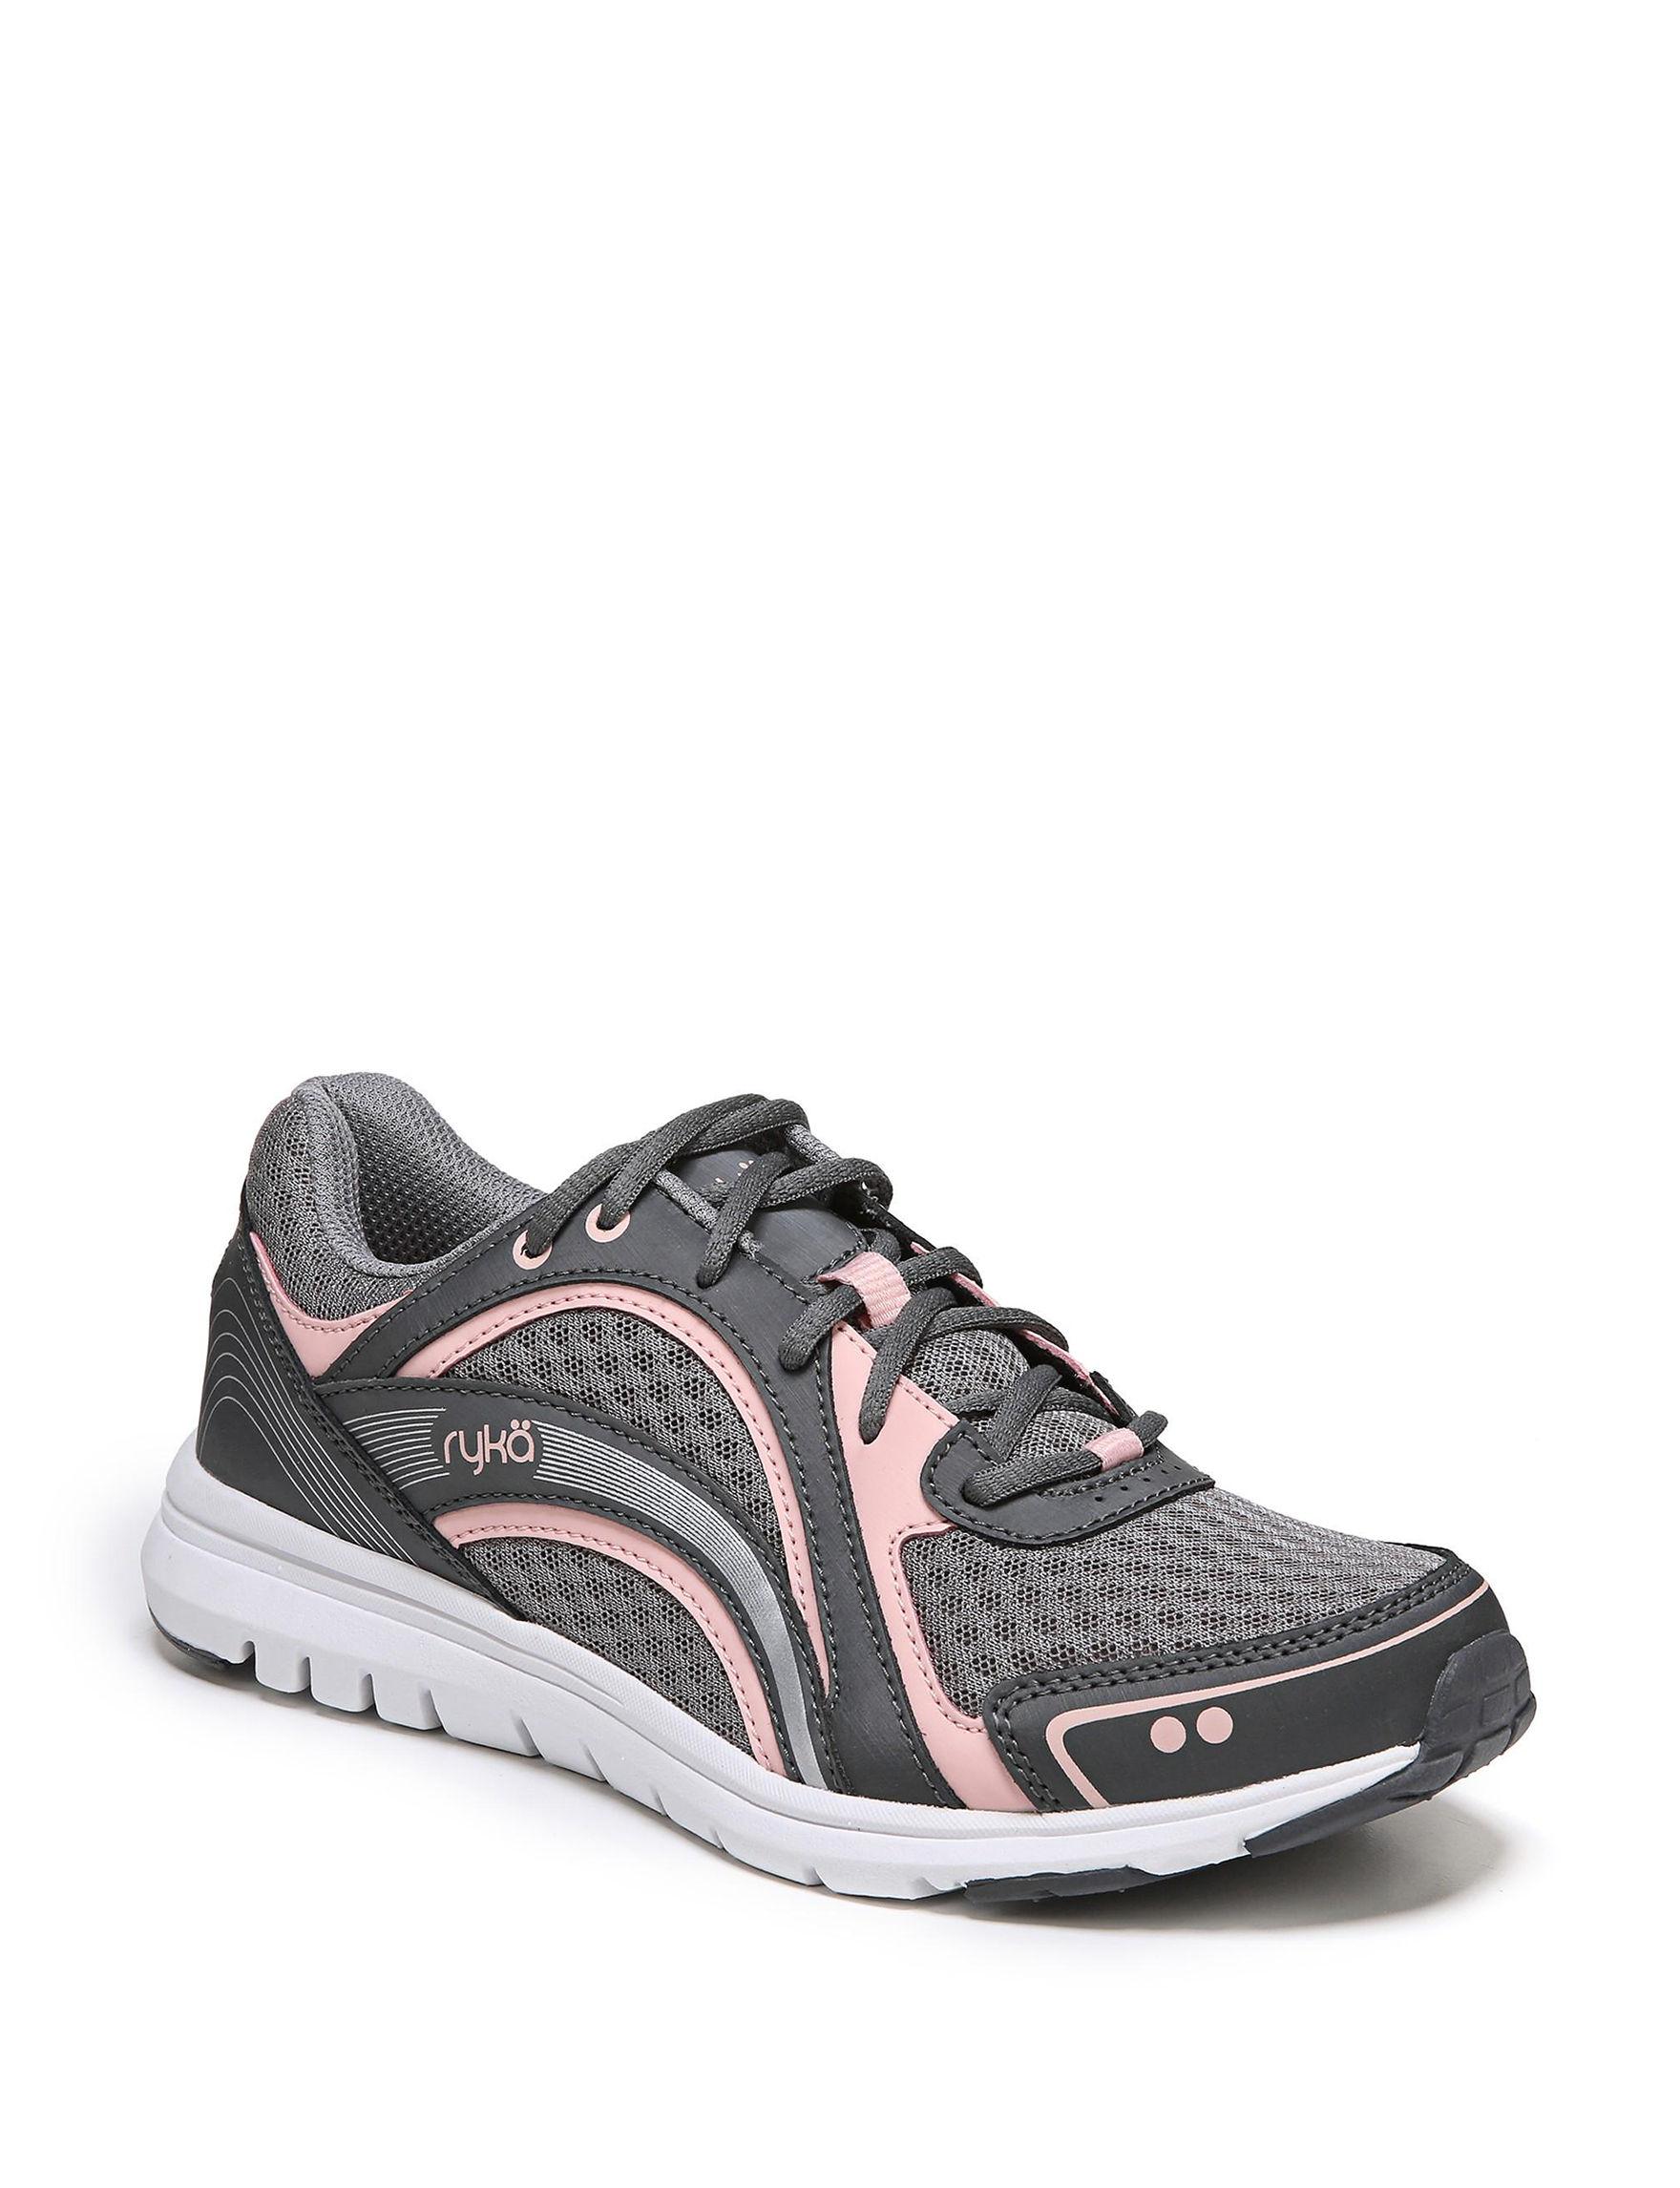 Ryka Grey / Pink Comfort Shoes